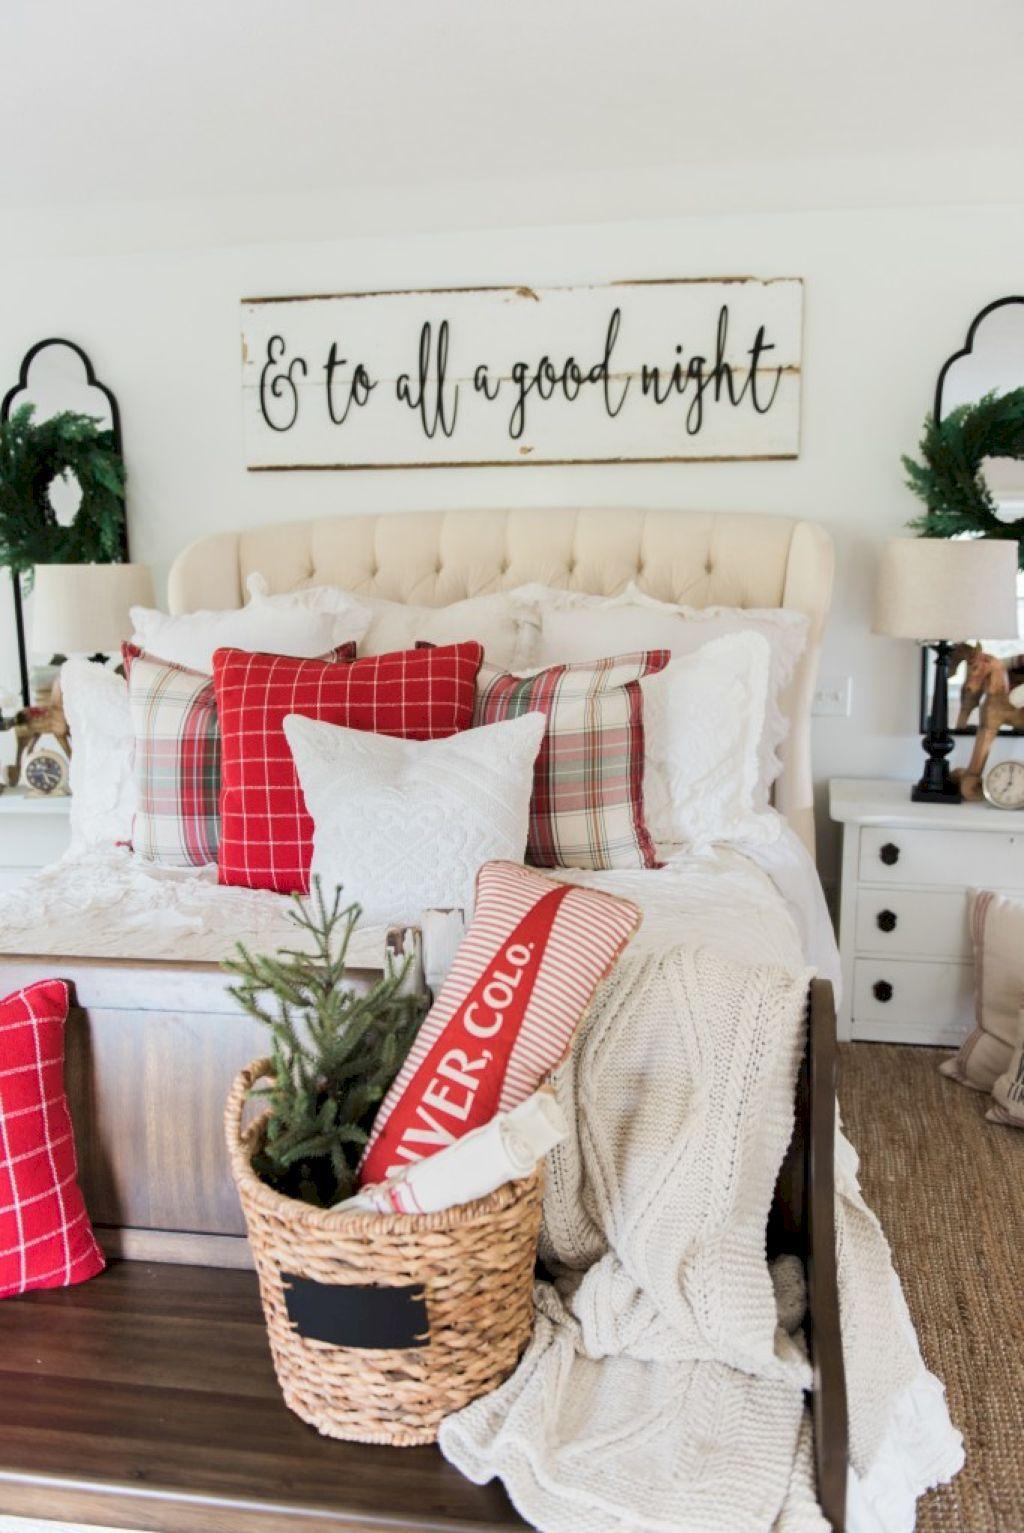 42 Awesome Rustic Farmhouse Bedroom Decor Ideas | Farmhouse bedroom ...